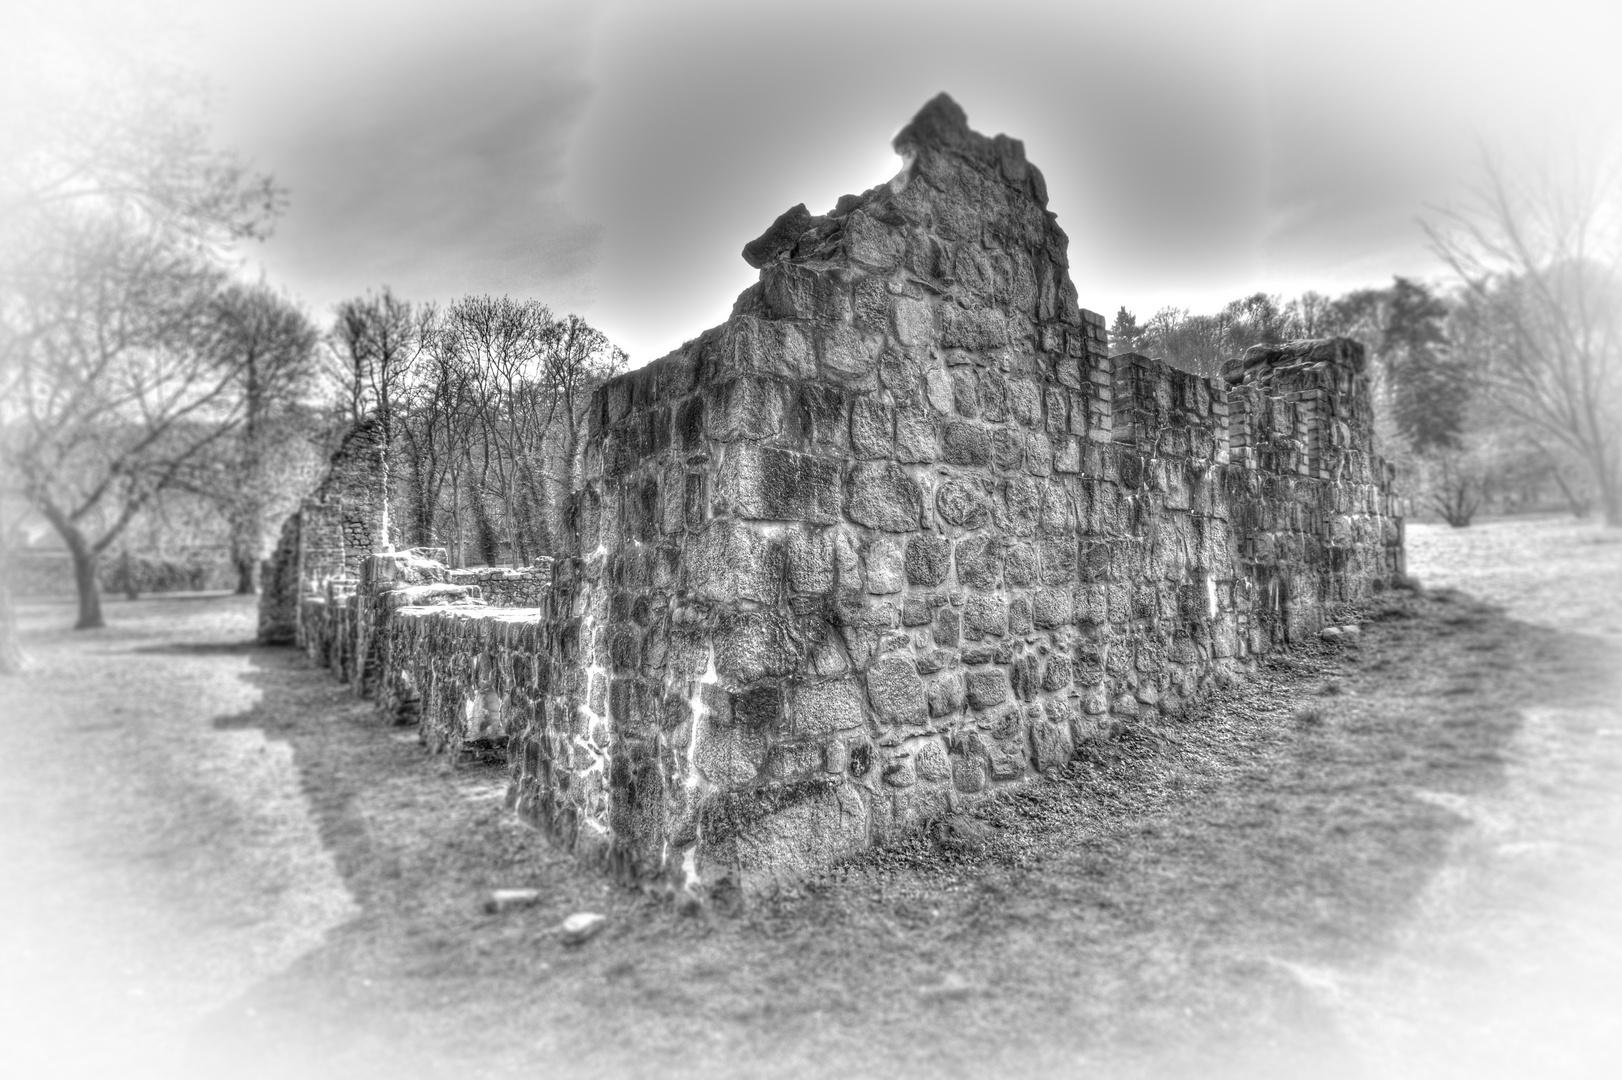 Kloster Chorin Ruine